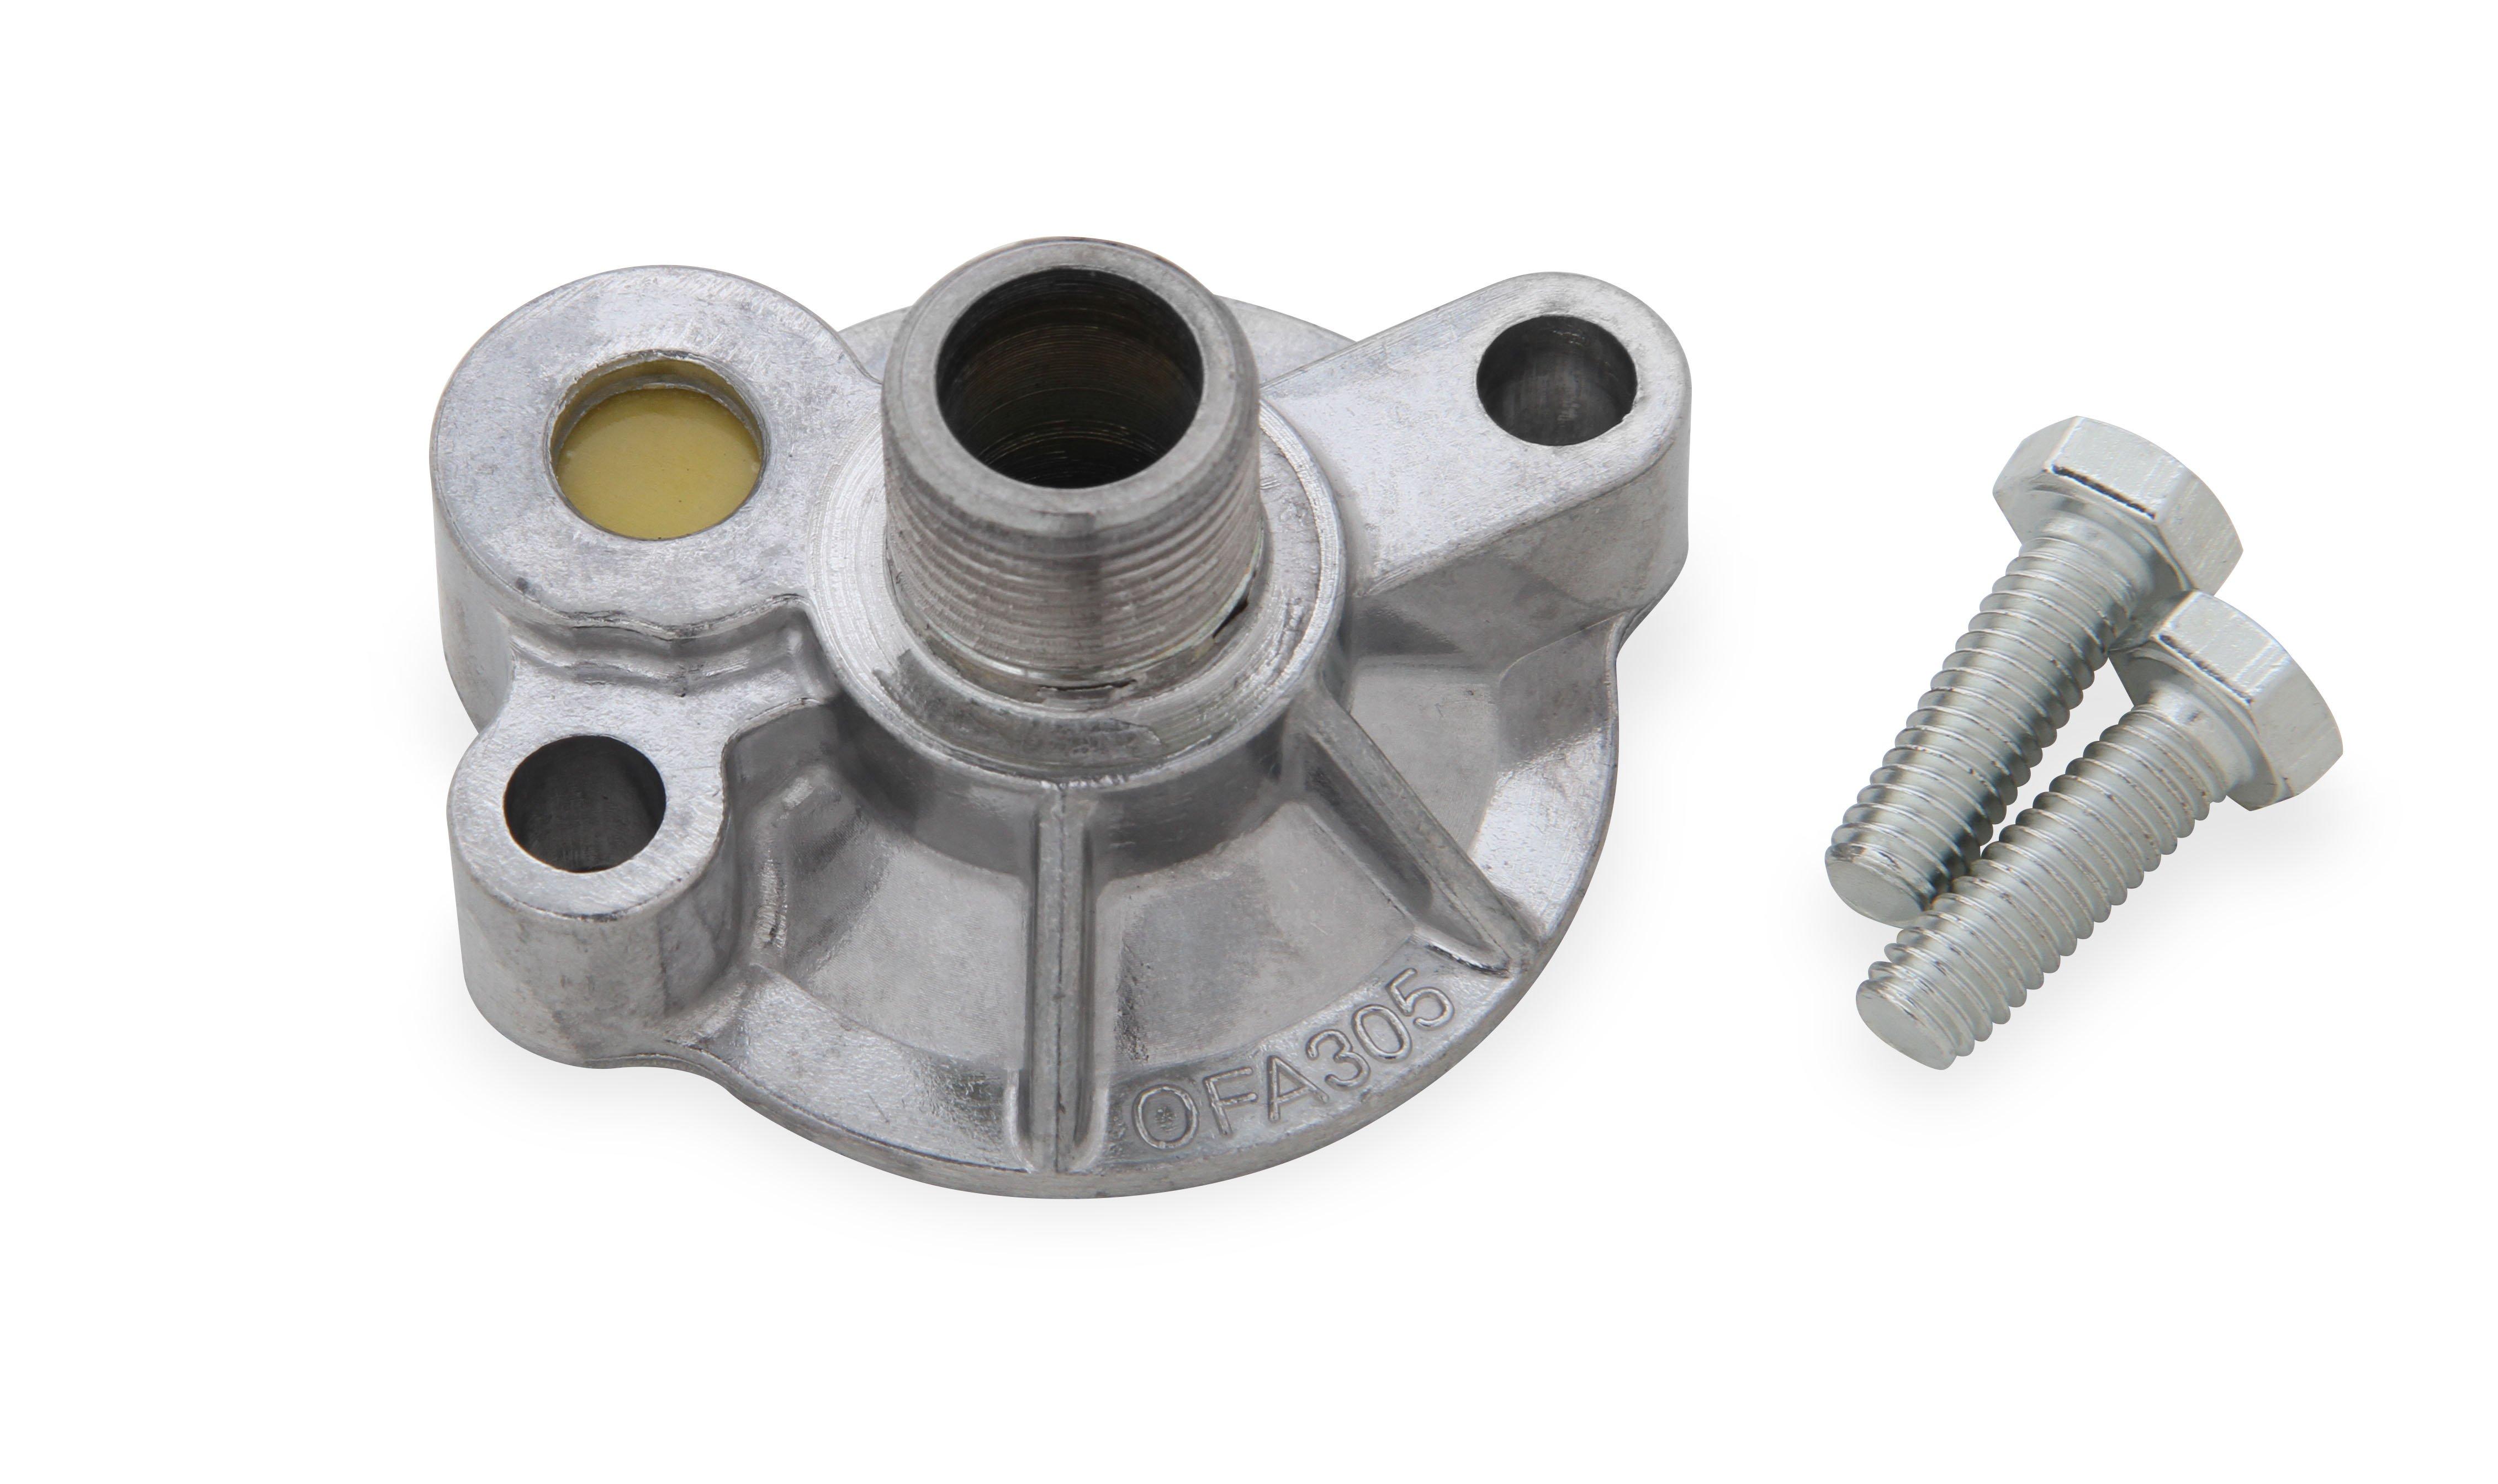 MAHLE Original B32597 Engine Oil Filter Adapter Gasket